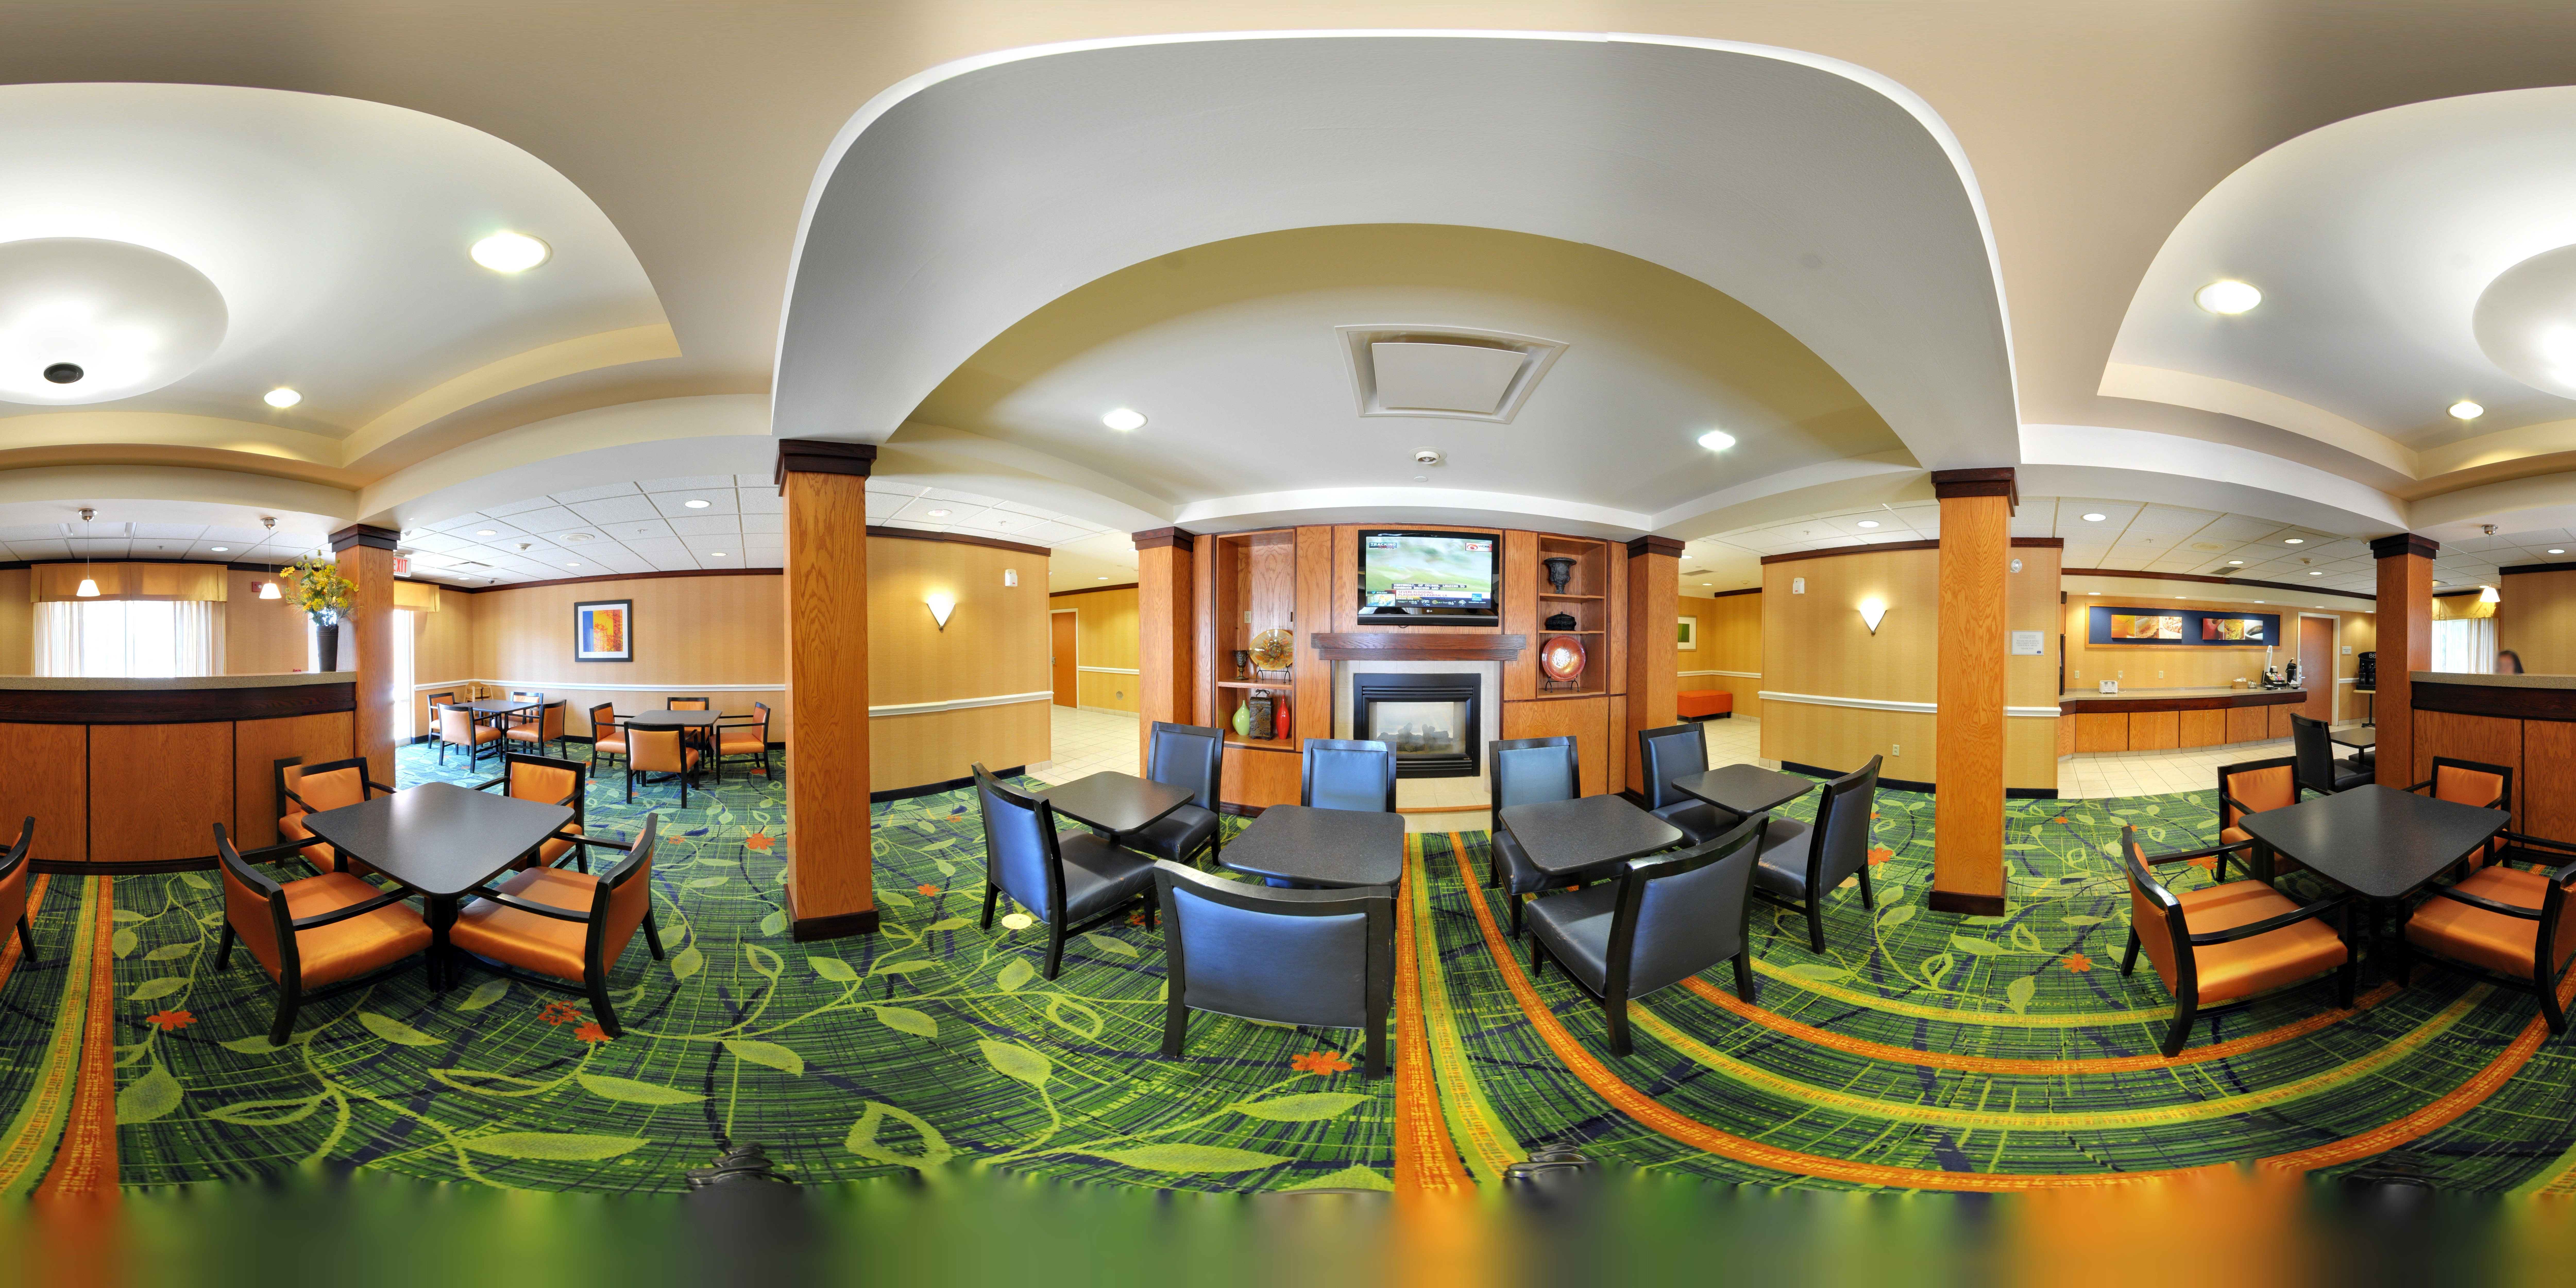 Fairfield Inn & Suites by Marriott Akron South image 22